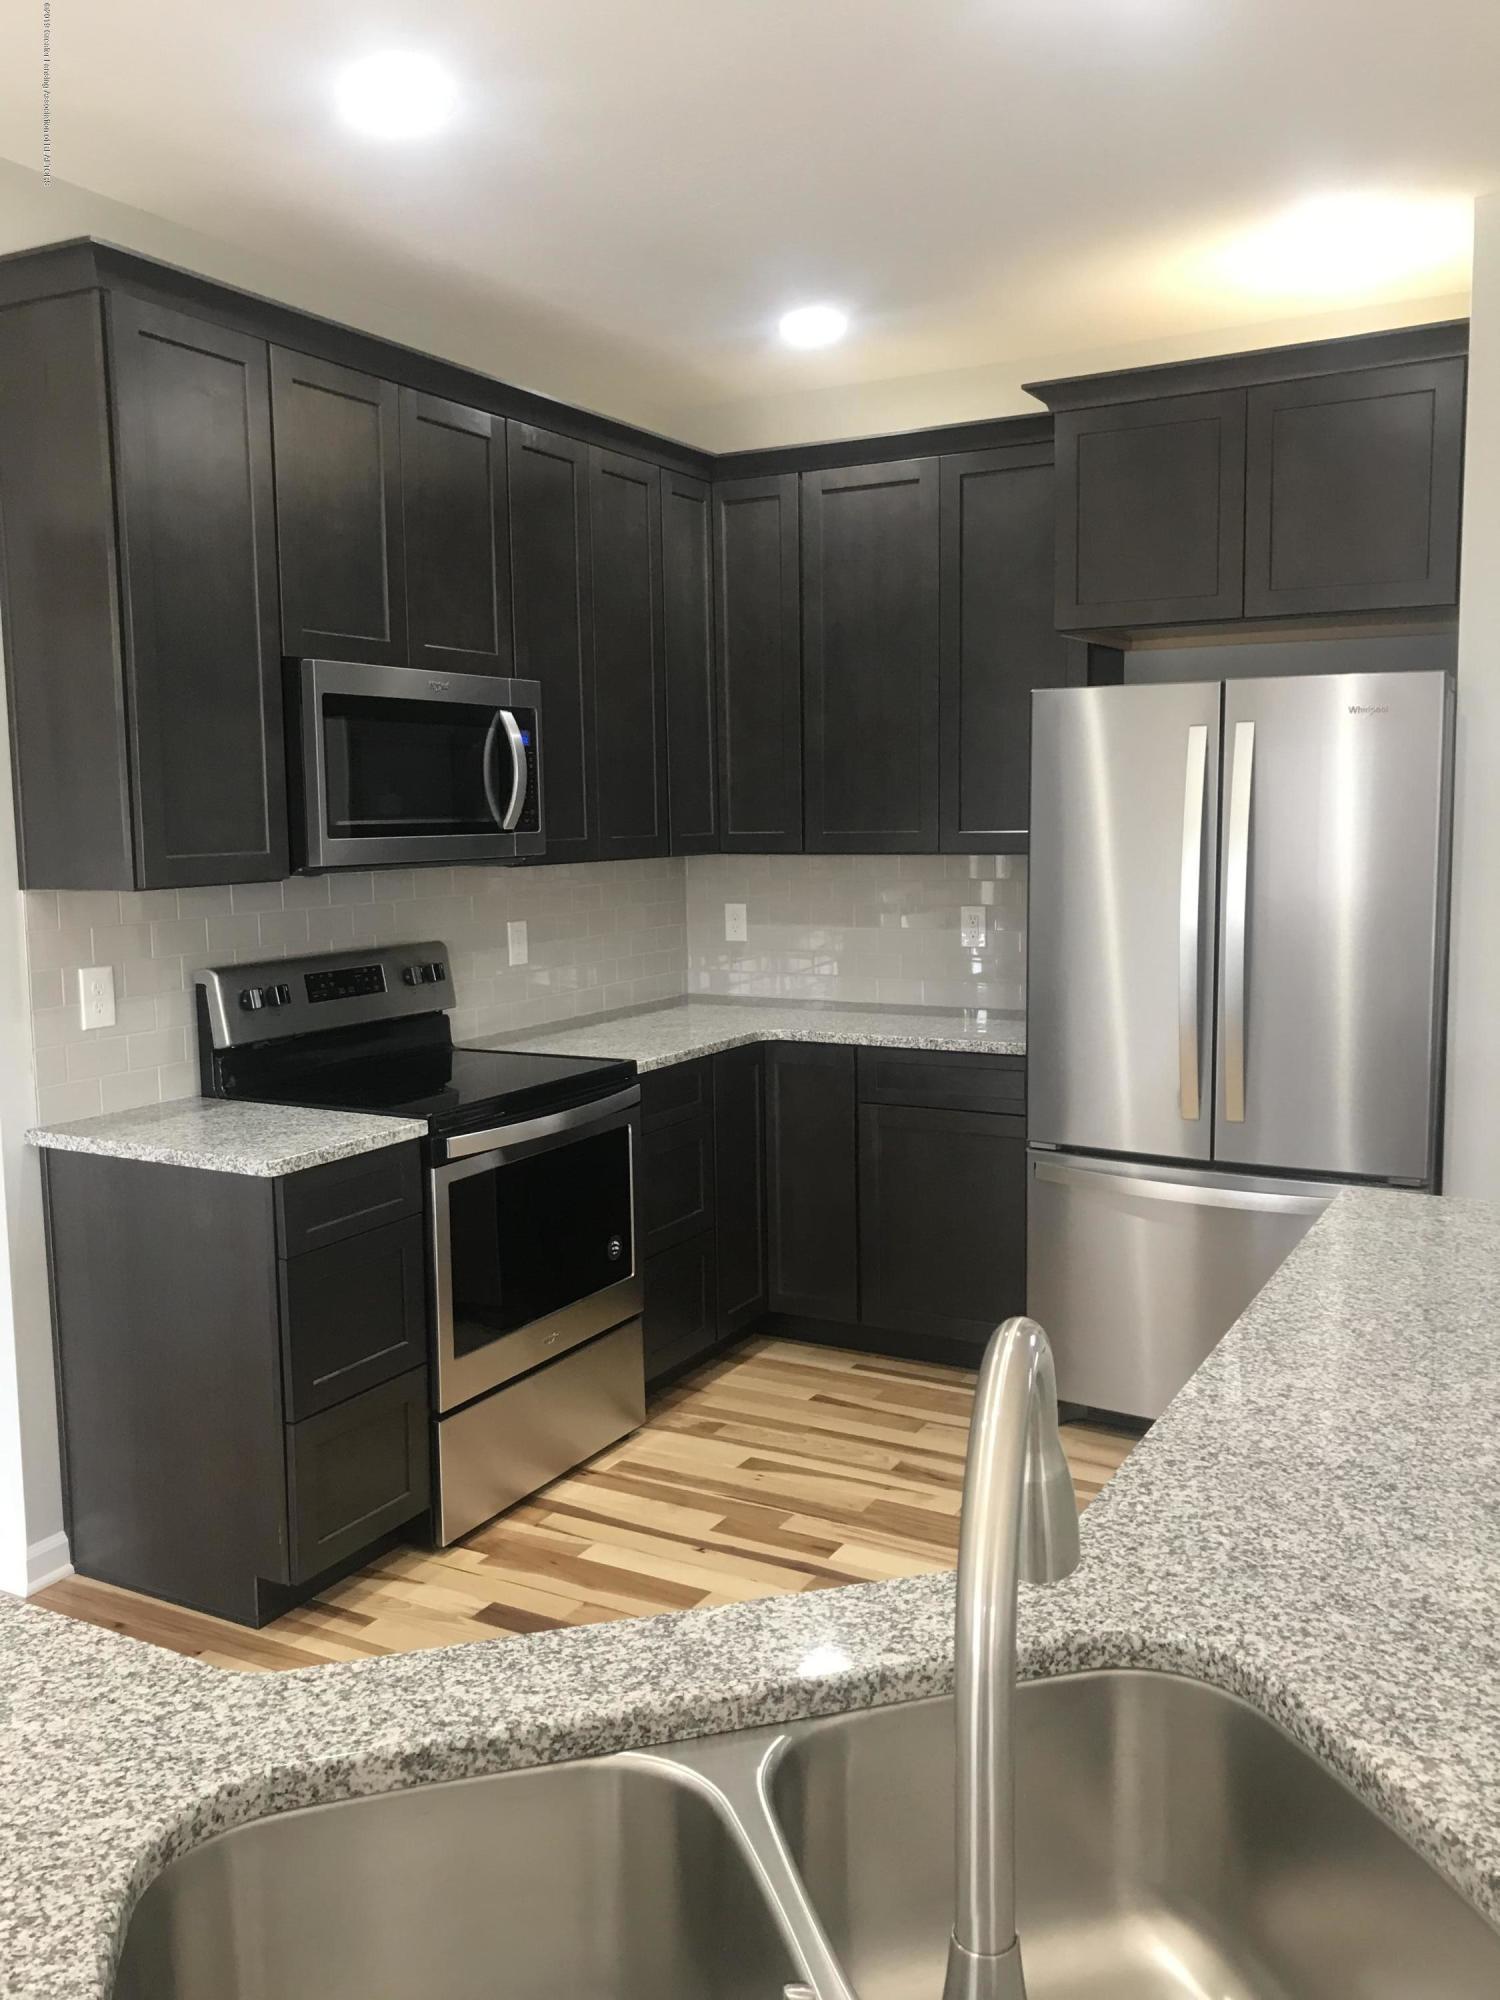 1391 Jackson Dr - Kitchen - 5